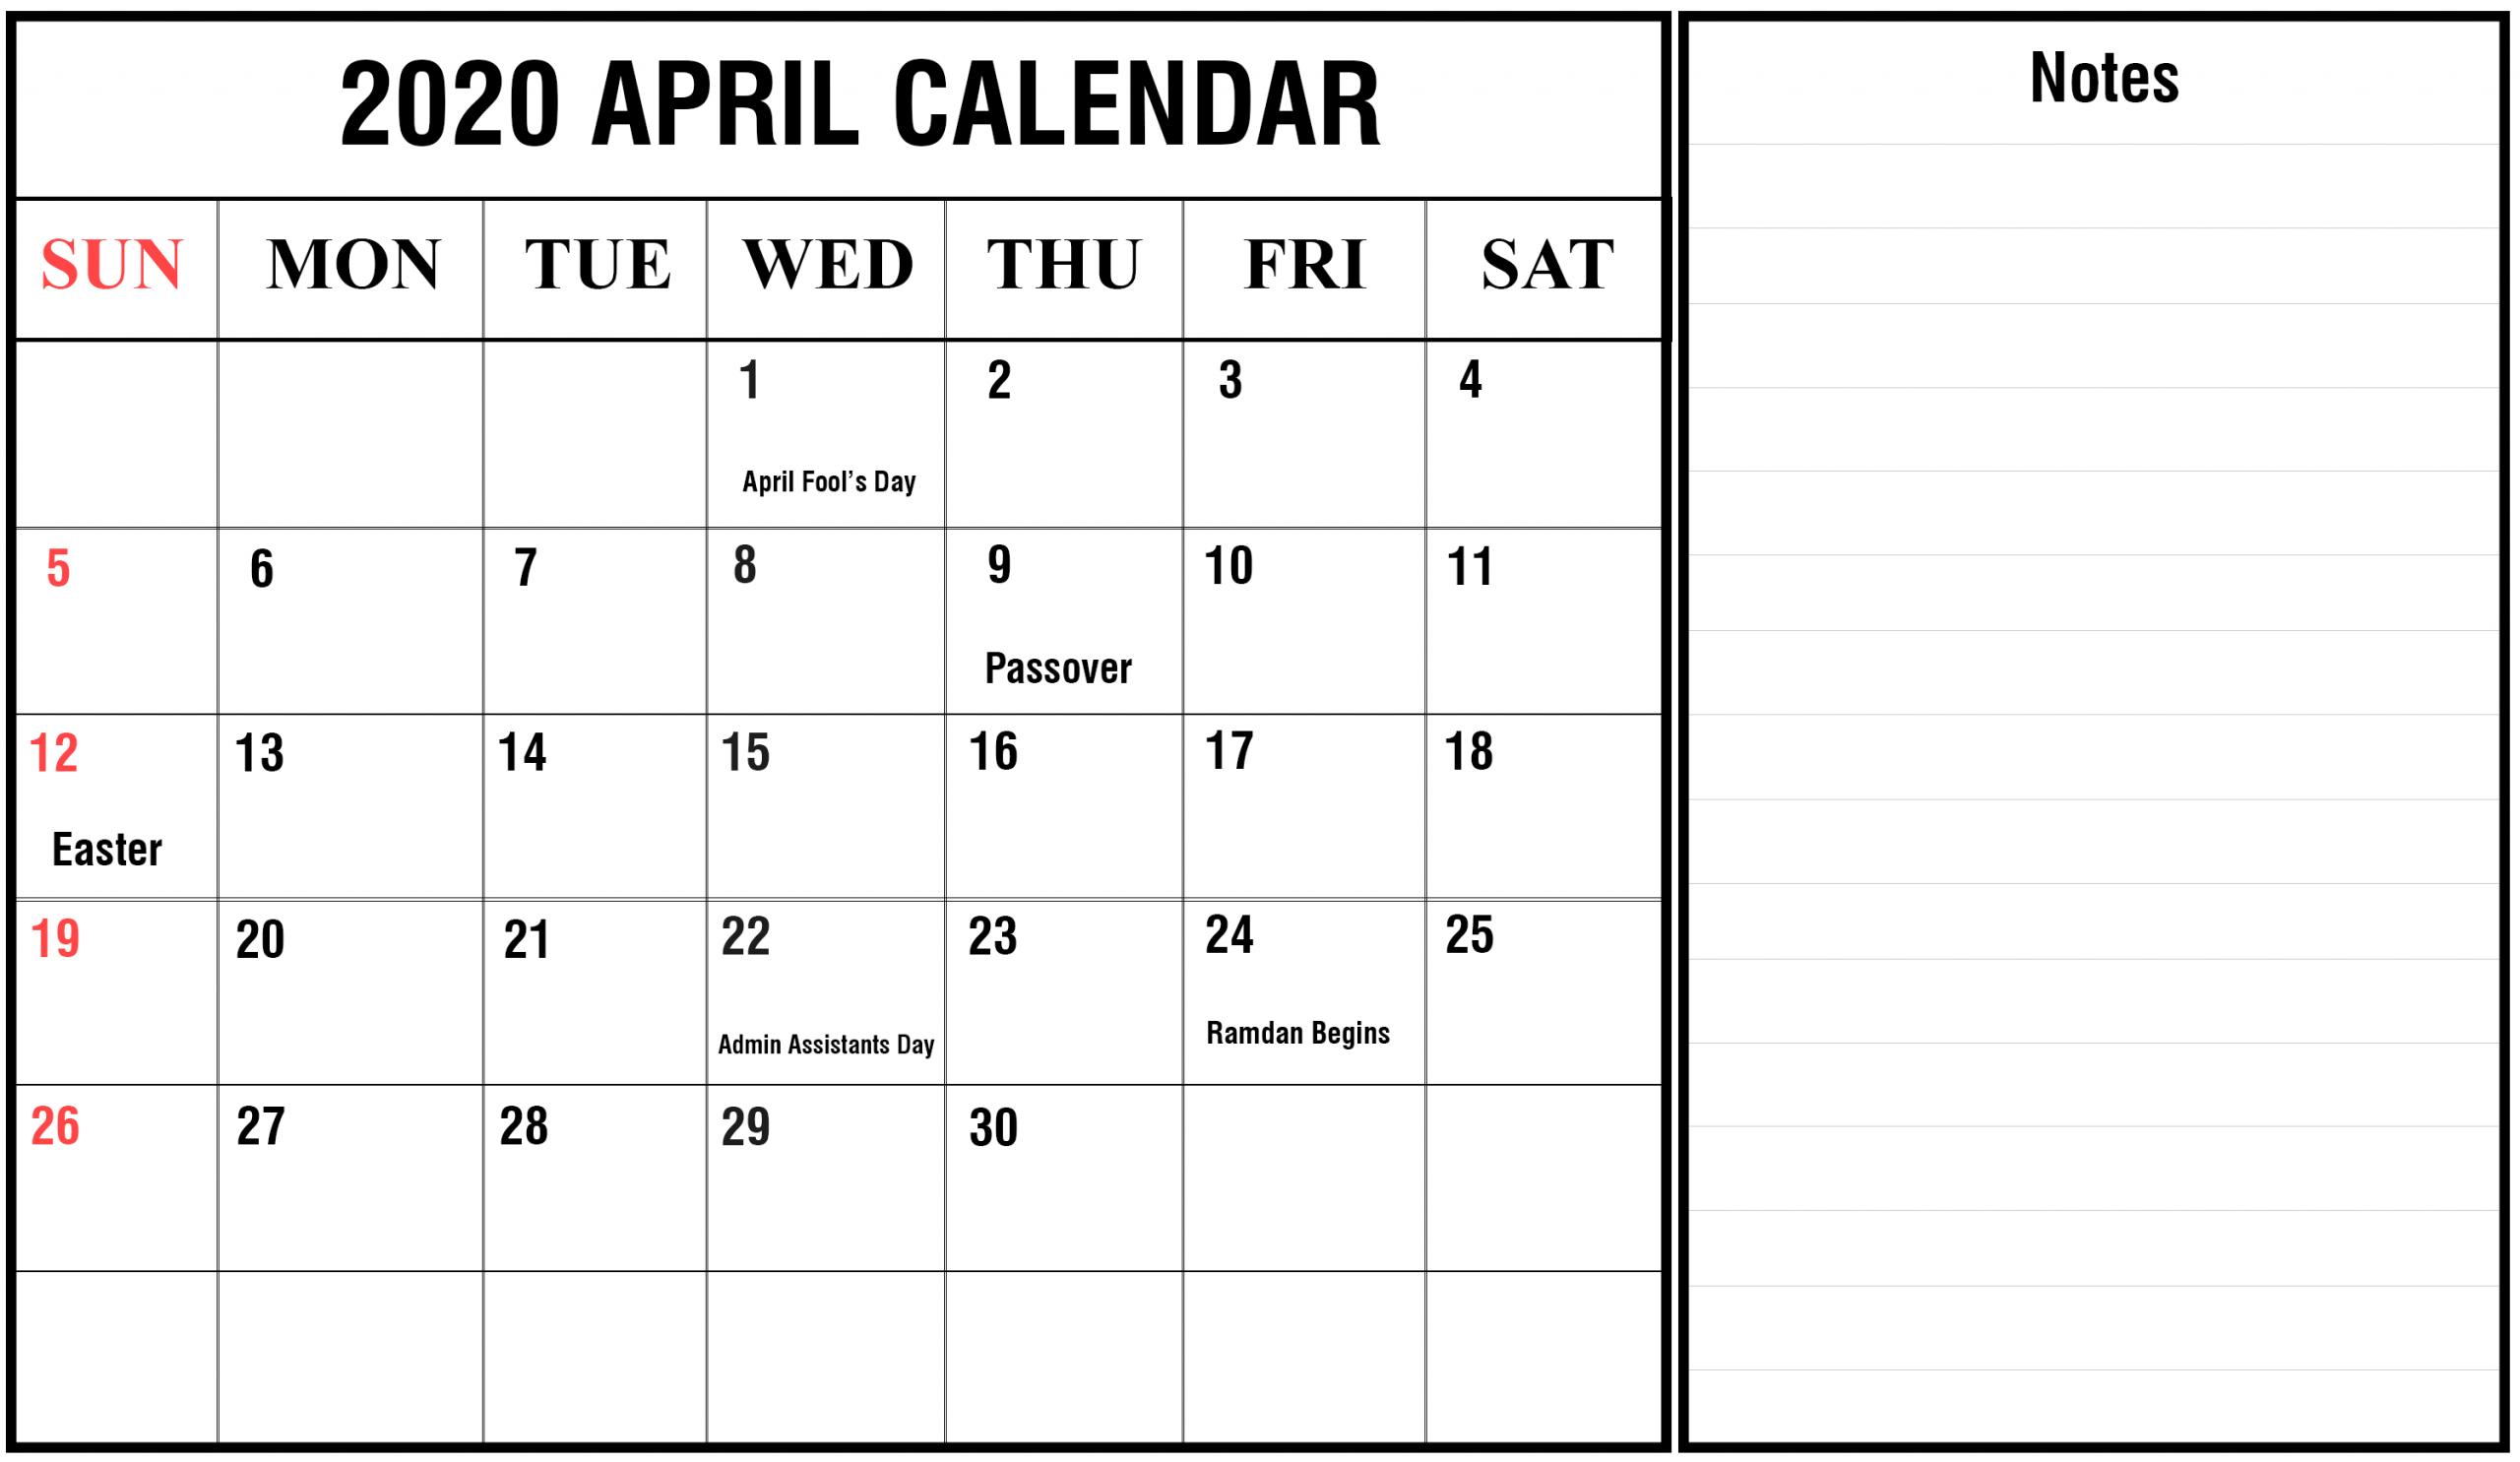 April 2020 Calendar With Notes | Printable Calendar Template